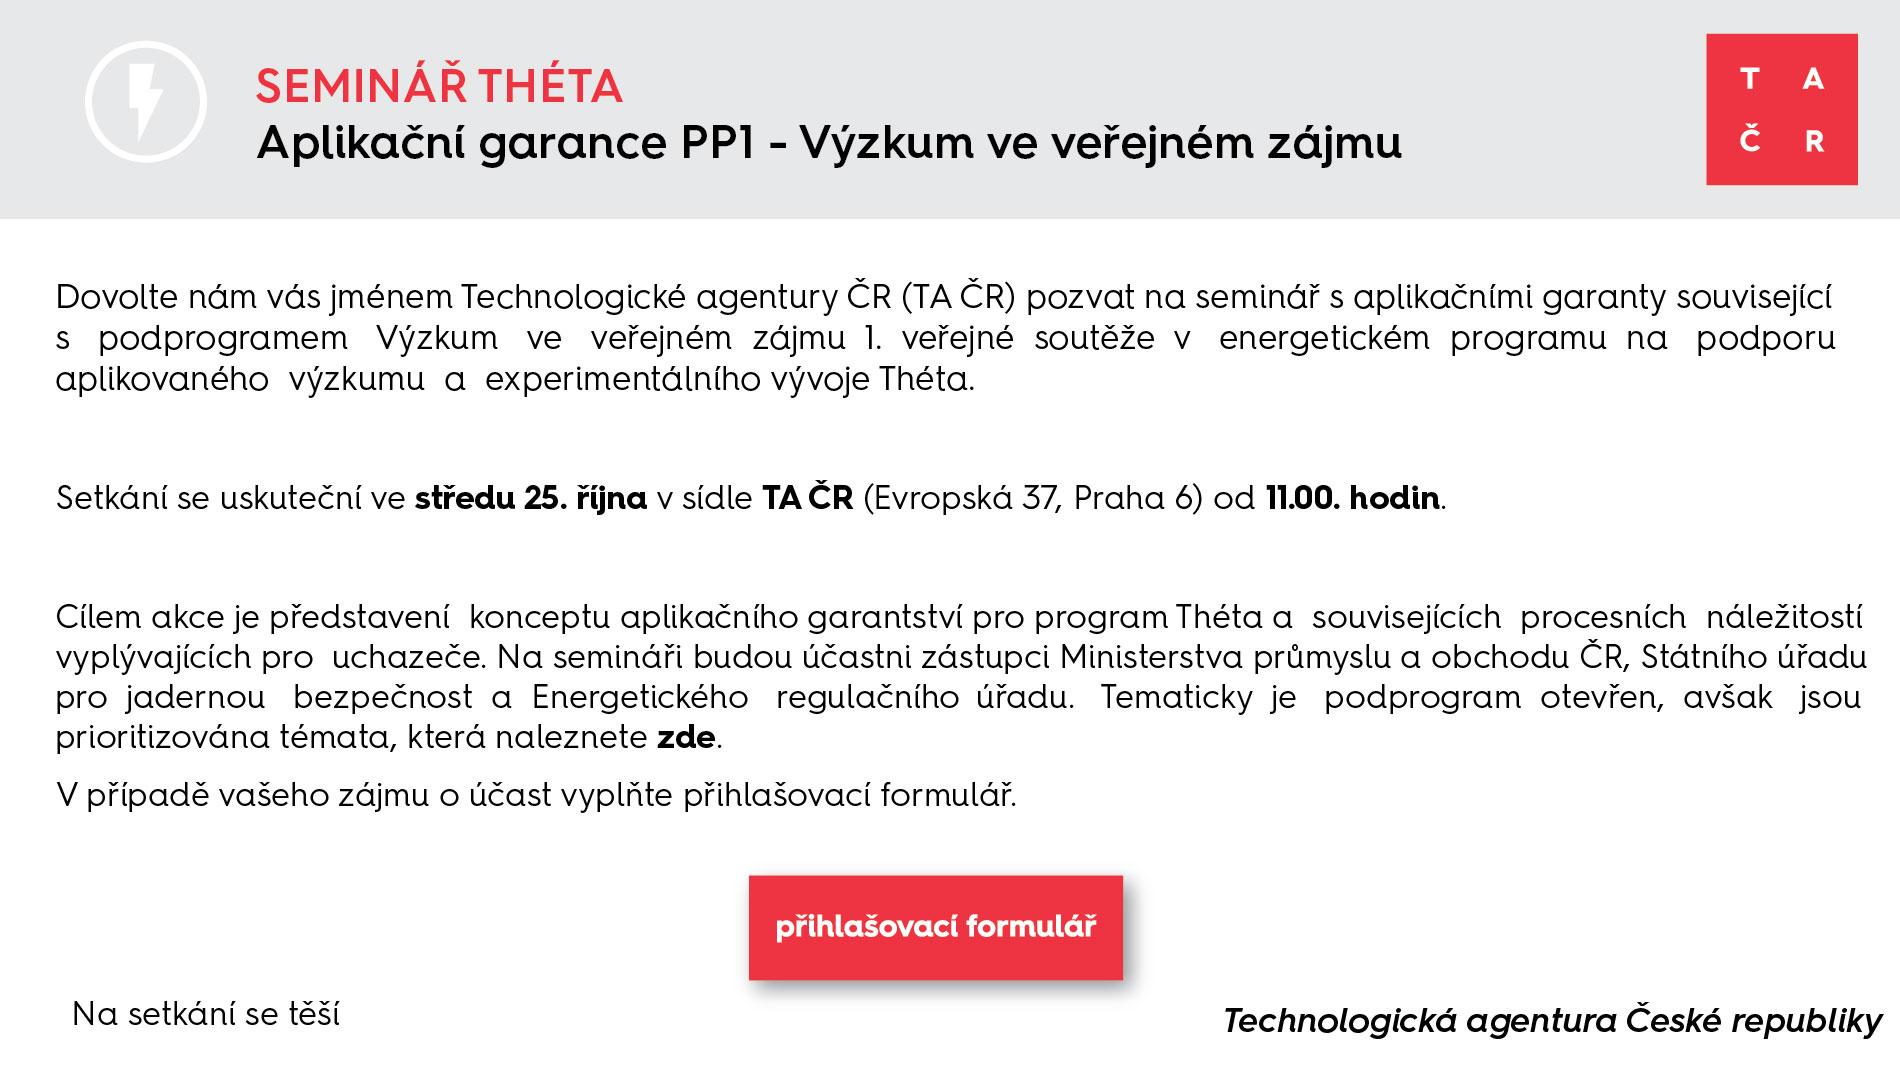 seminar theta PP1